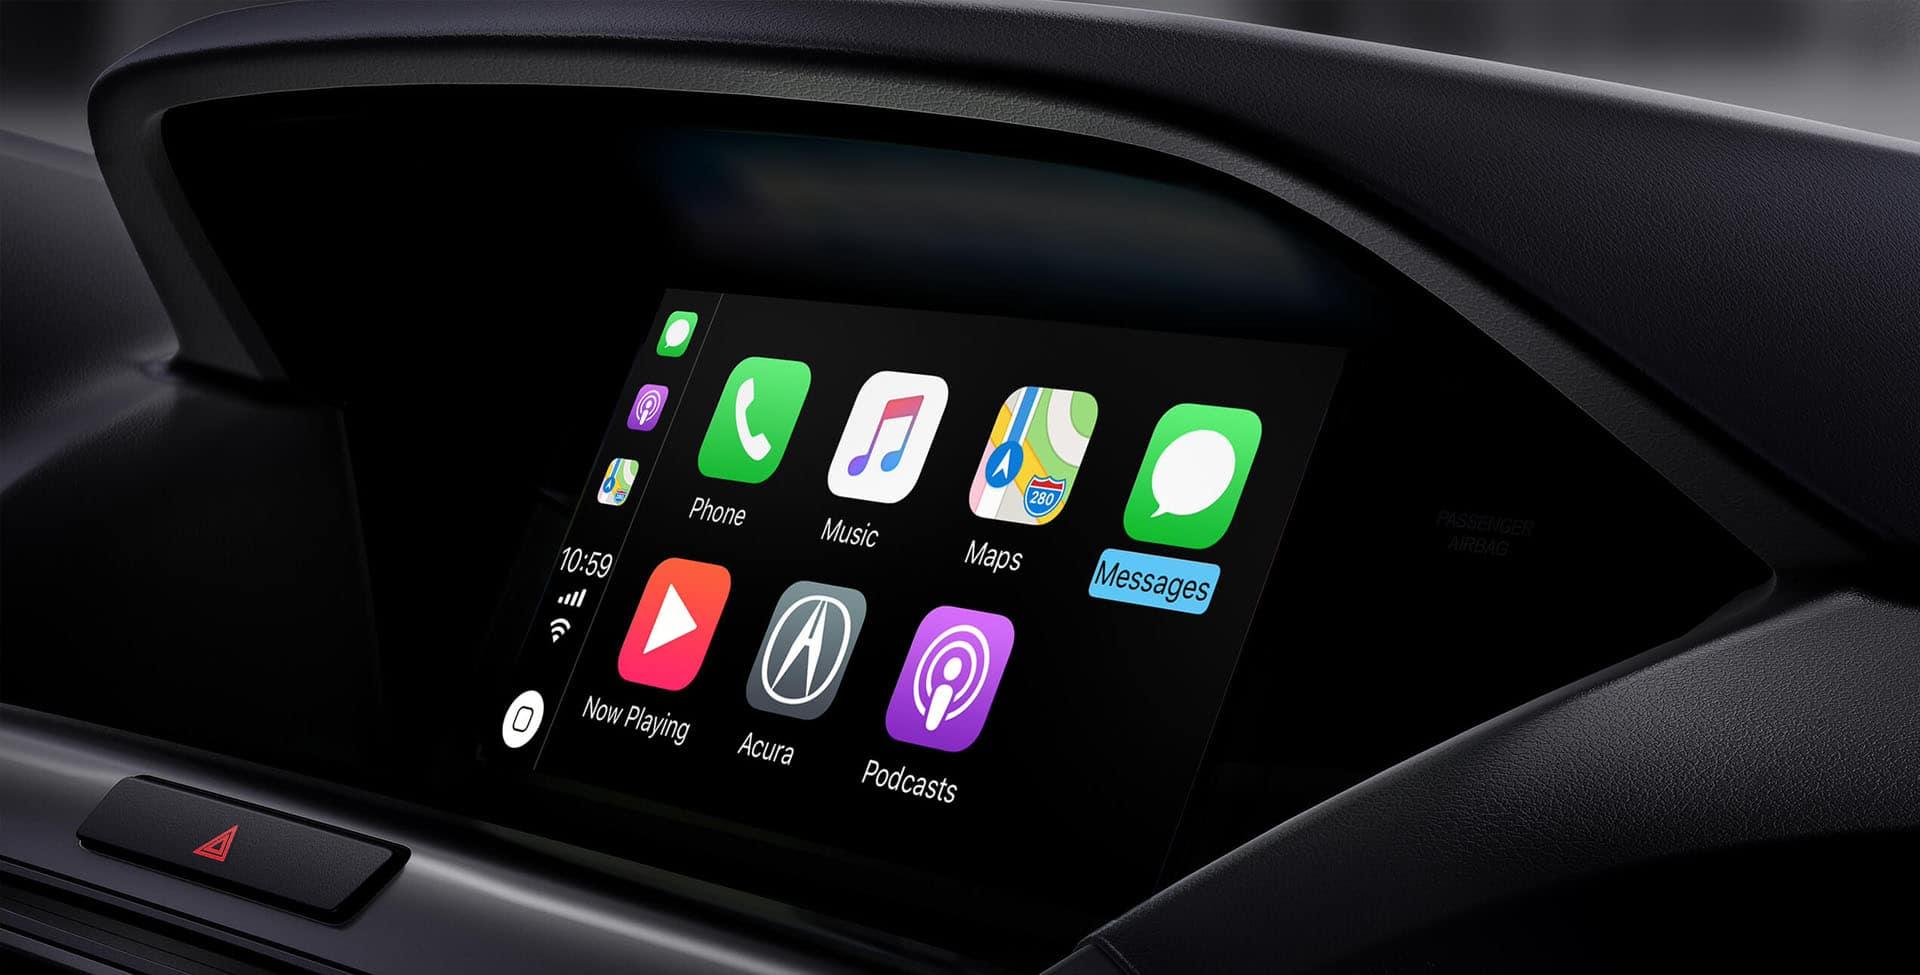 Acura MDX infotainment screen